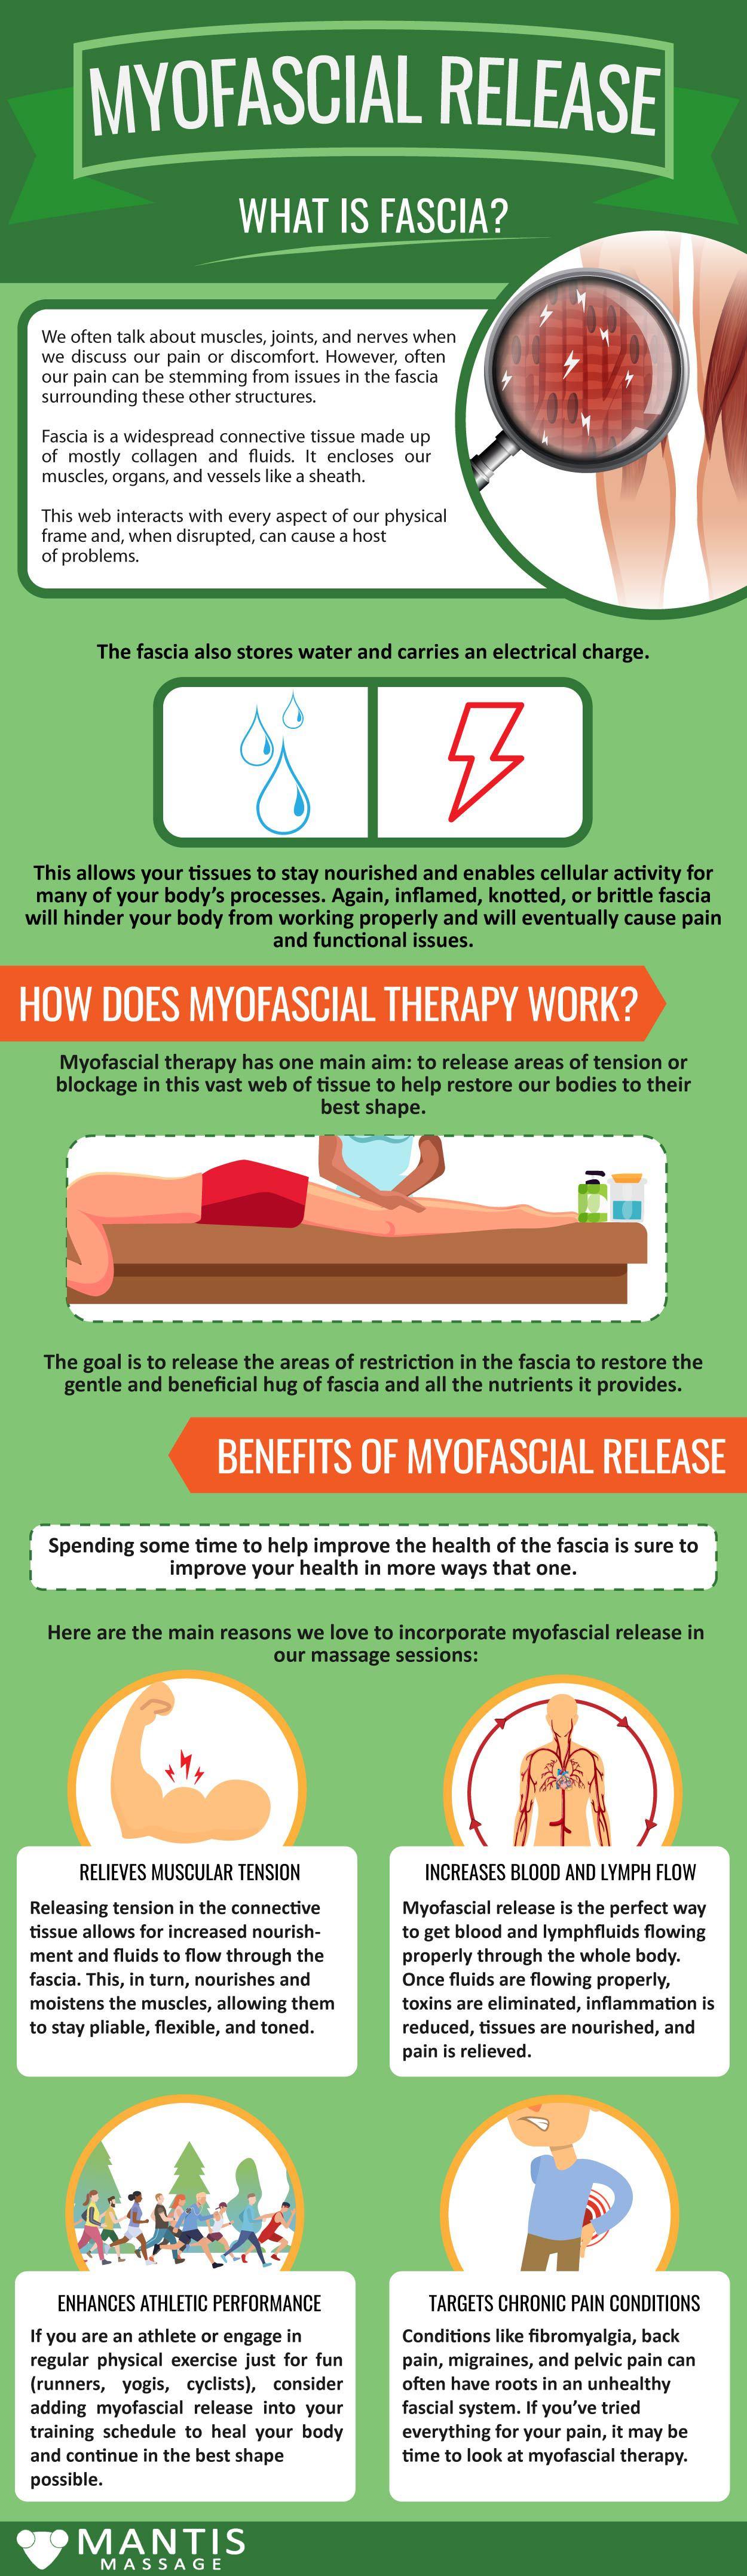 Mantis Massage - Myofascial Release Infographic Draft 1 (1).jpg